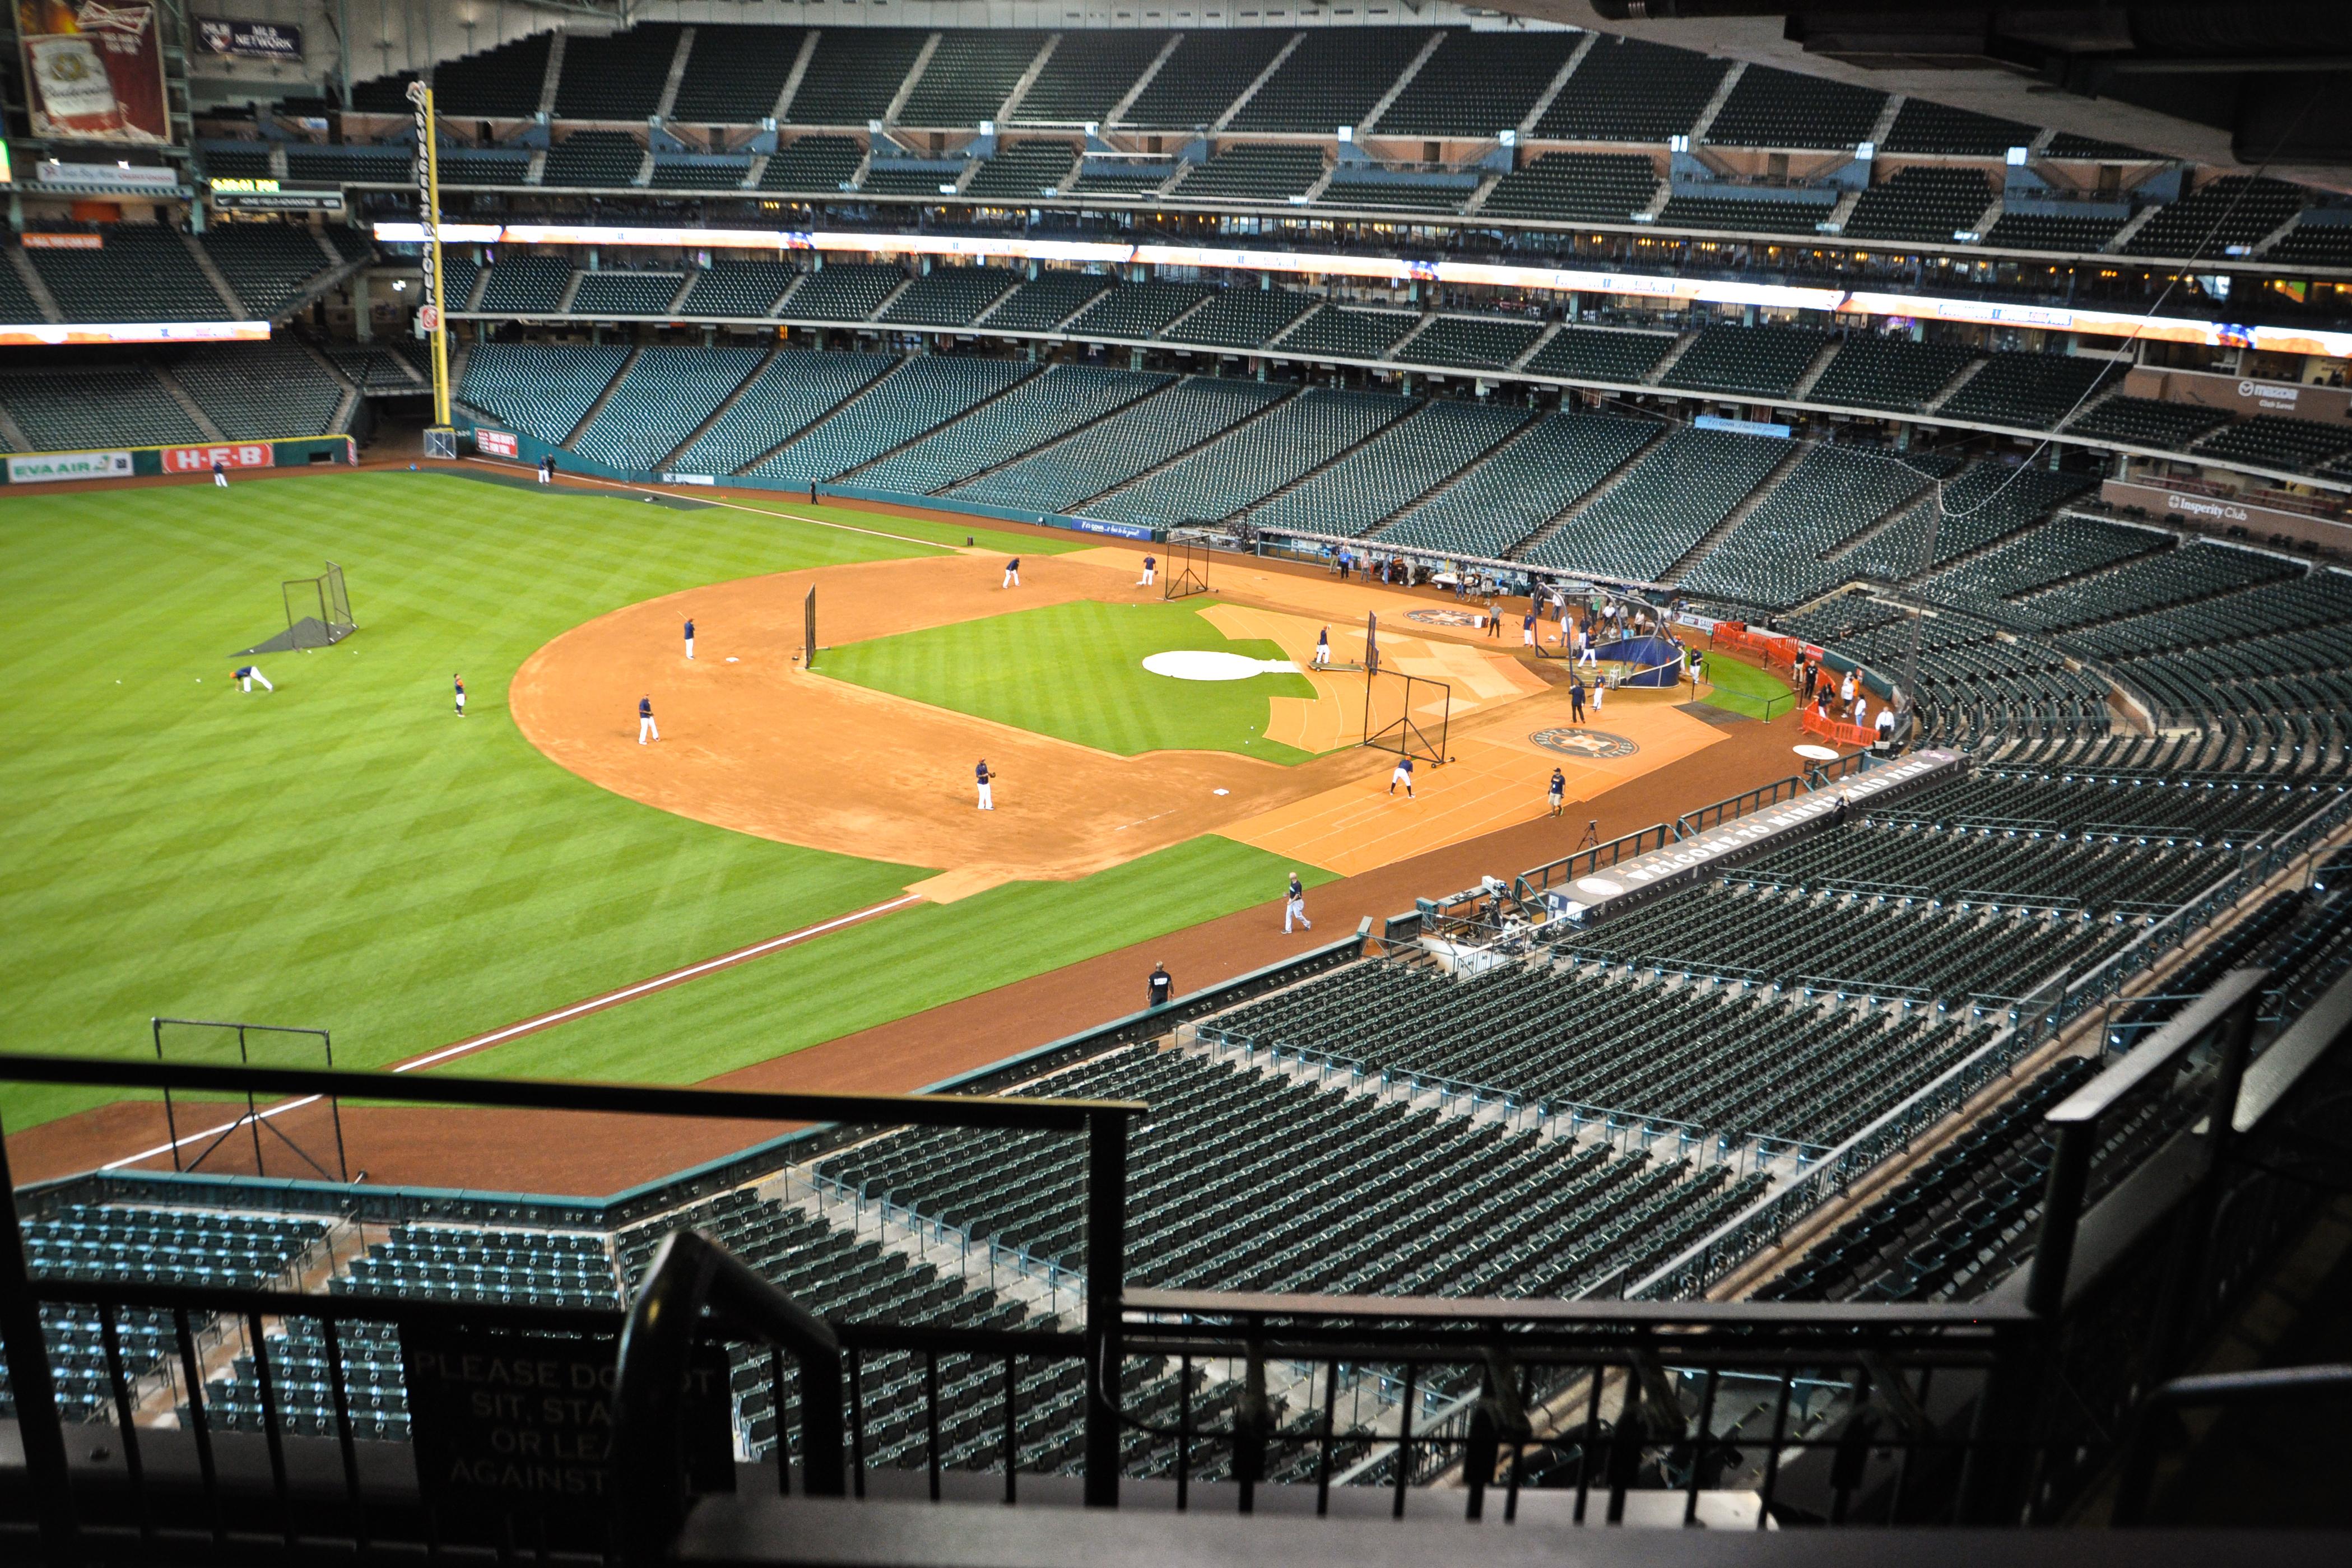 Baseball Diamond at Minute Maid Park